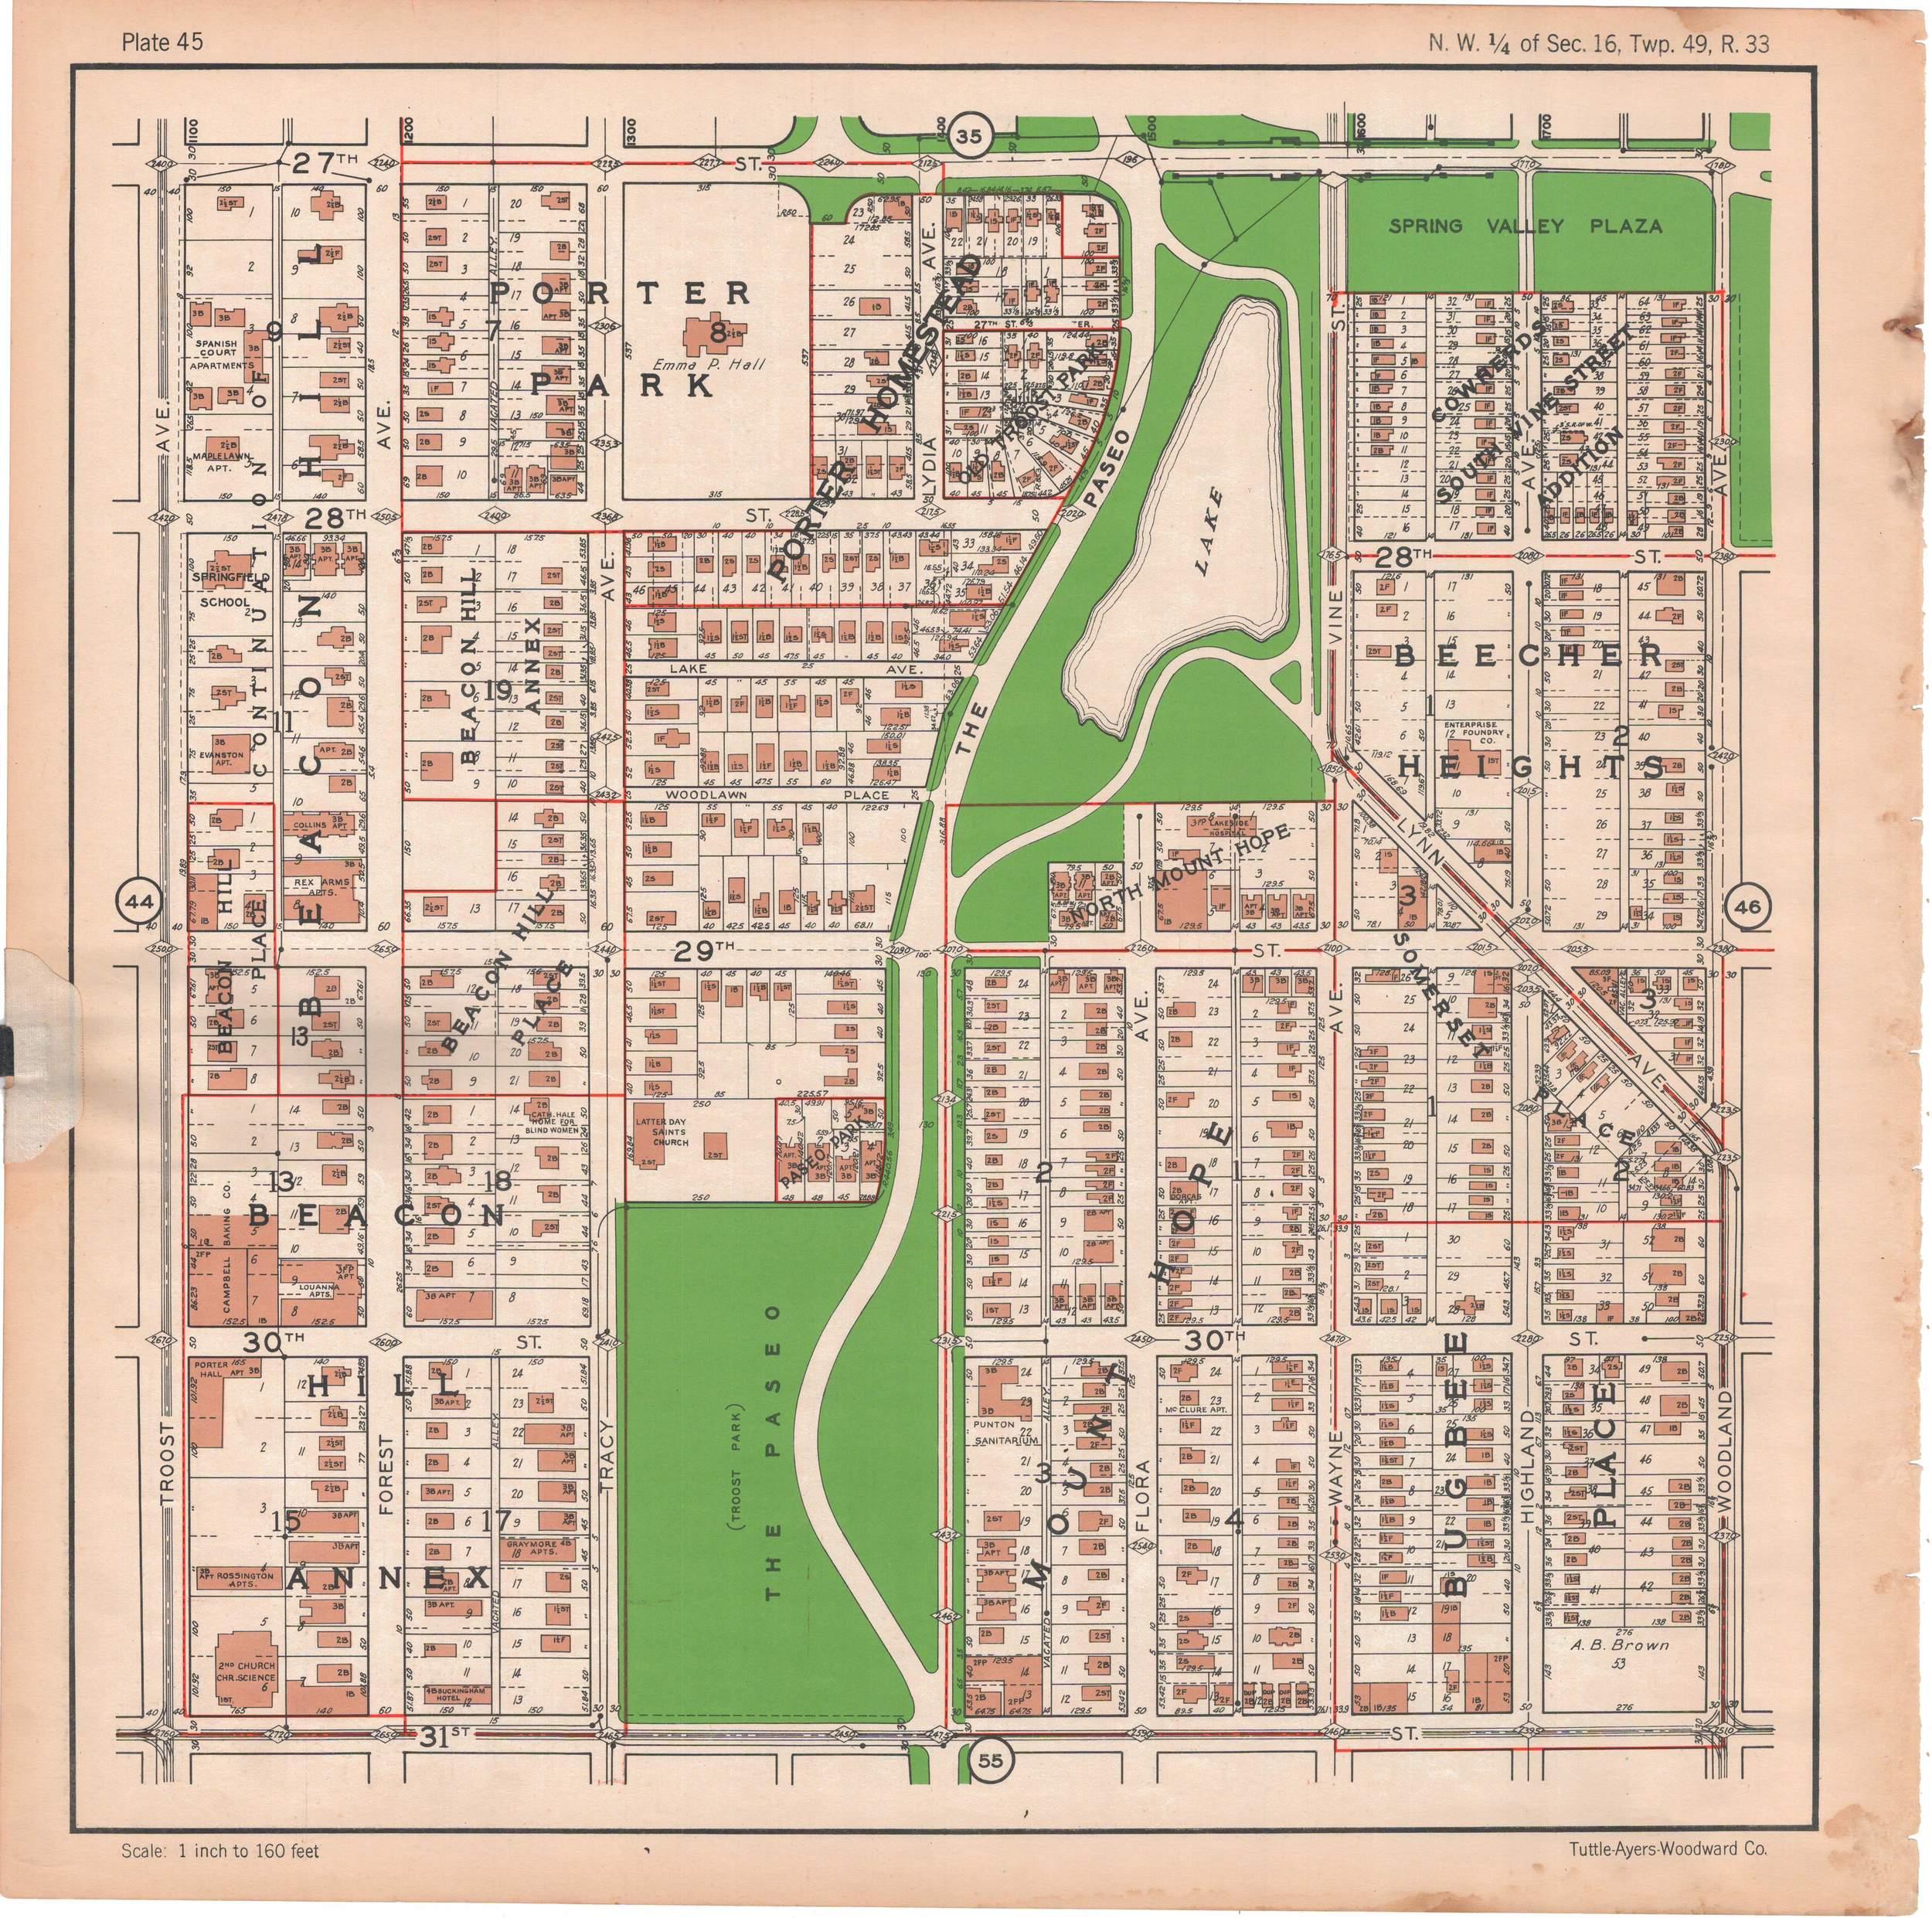 1925 TUTTLE_AYERS_Plate 45.JPG